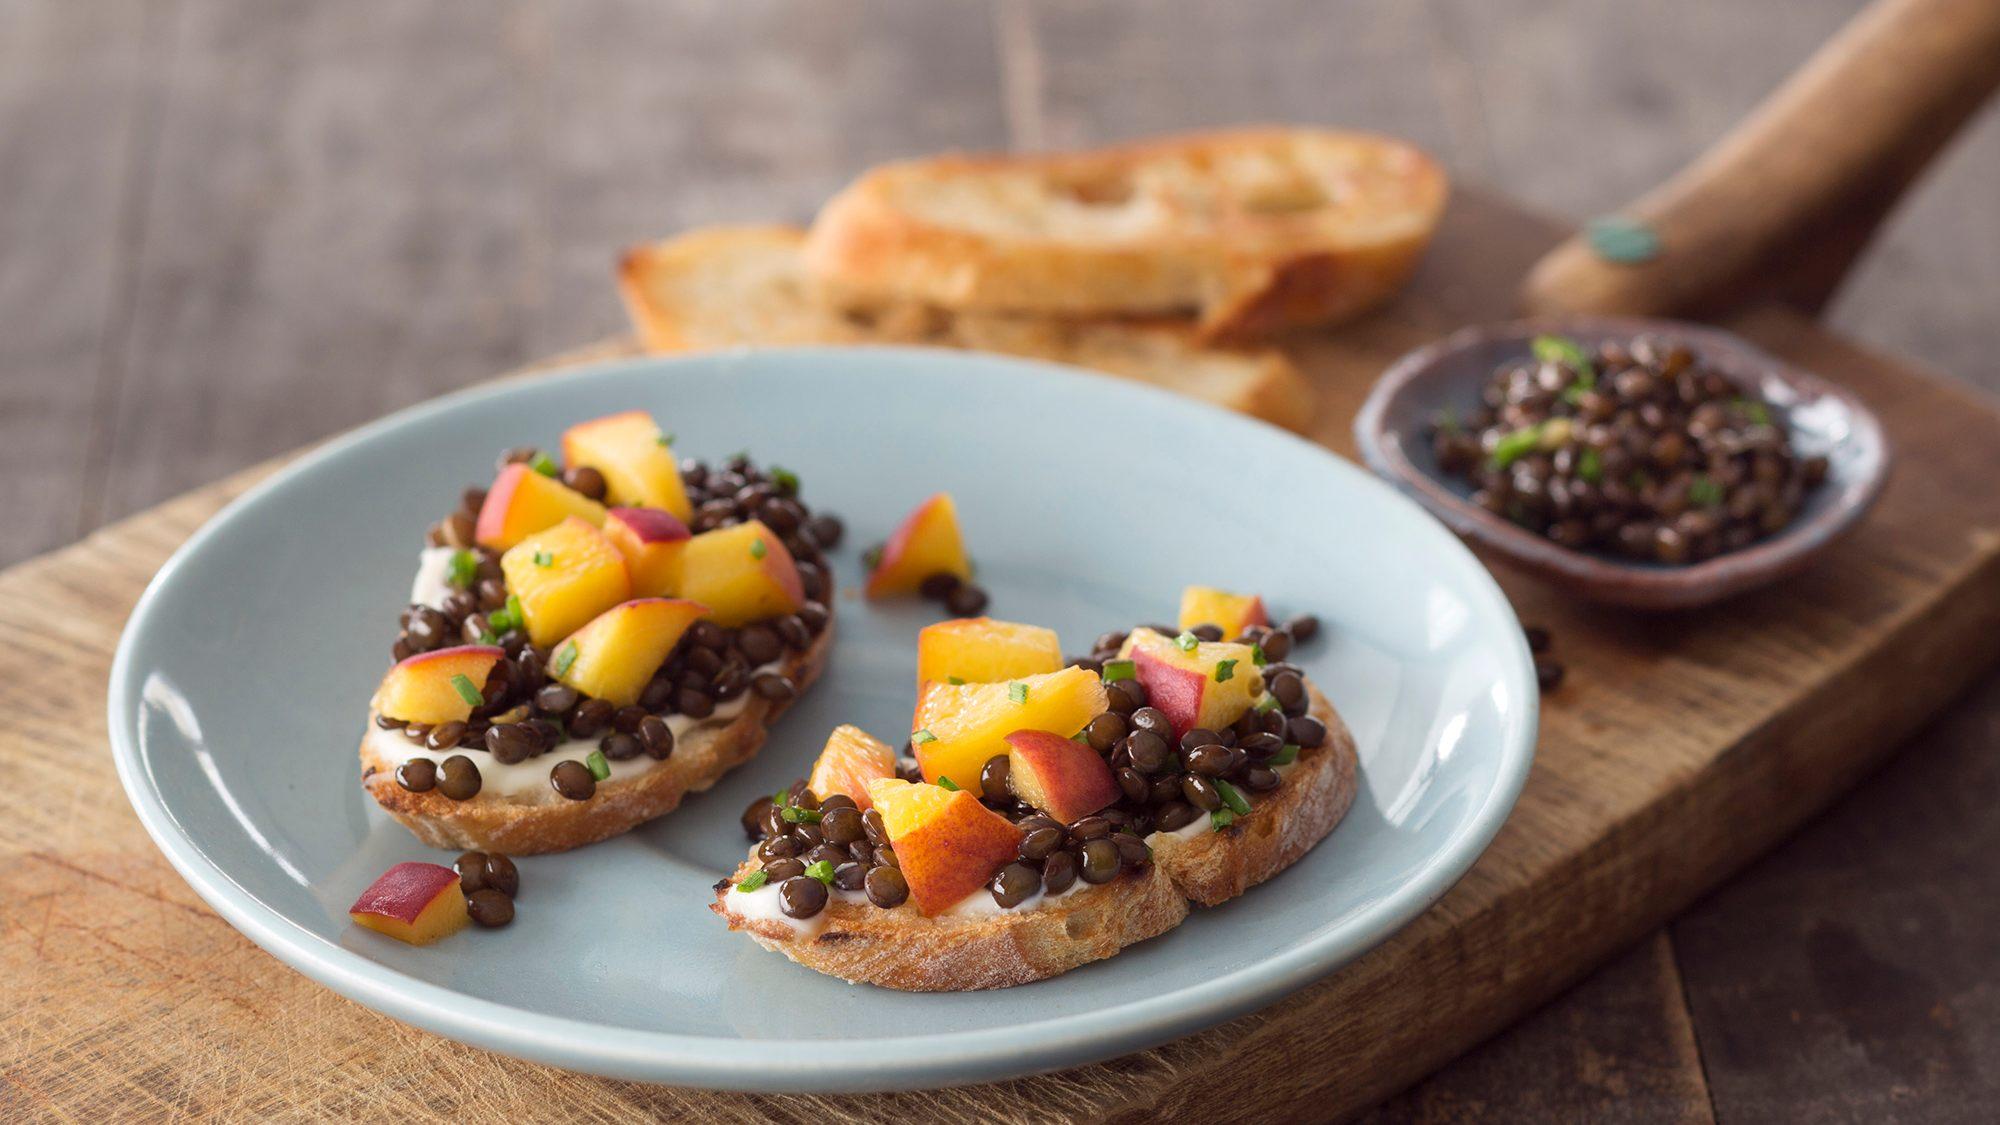 McCormick Gourmet Pickled Peach and Black Beluga Lentil Toasts